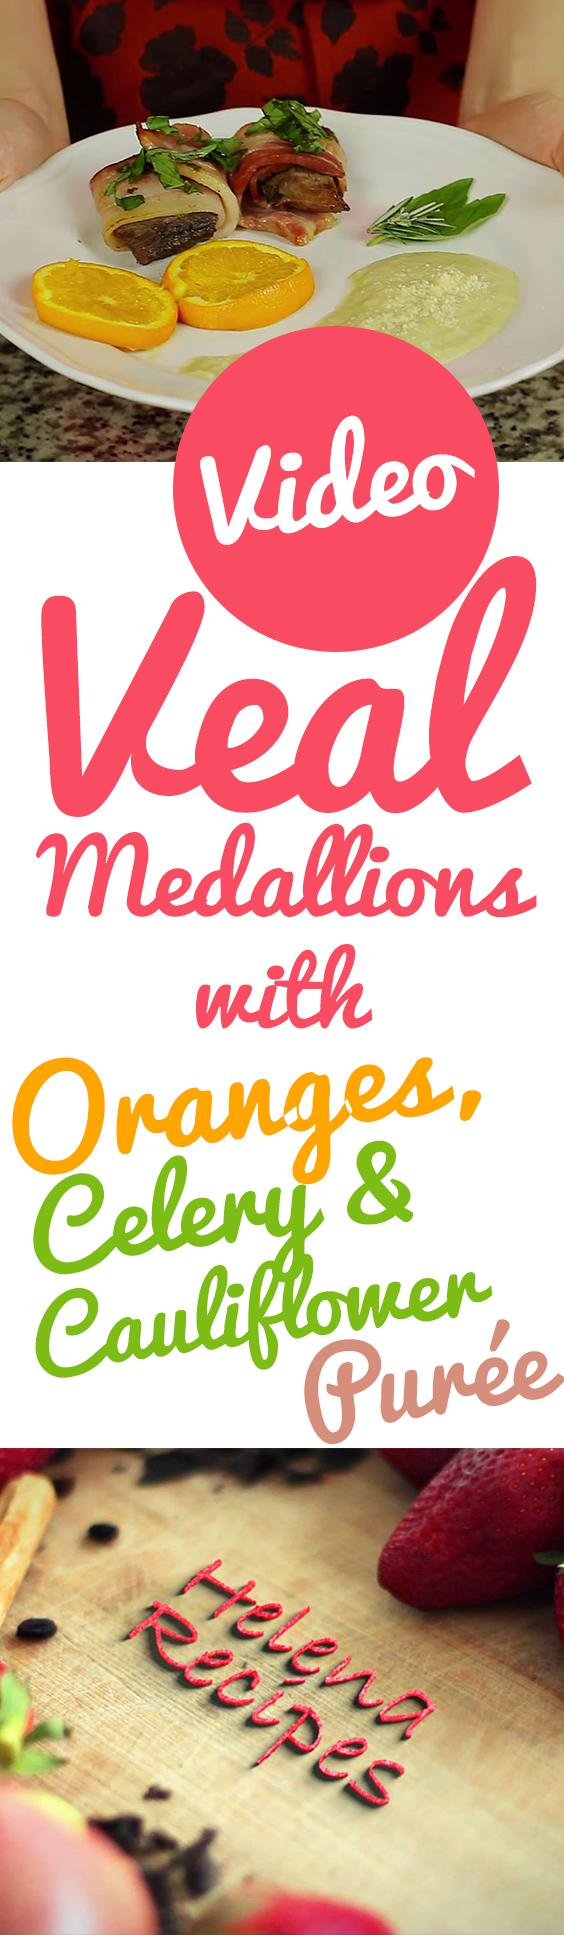 Veal-Medallions-Pinterest-Image